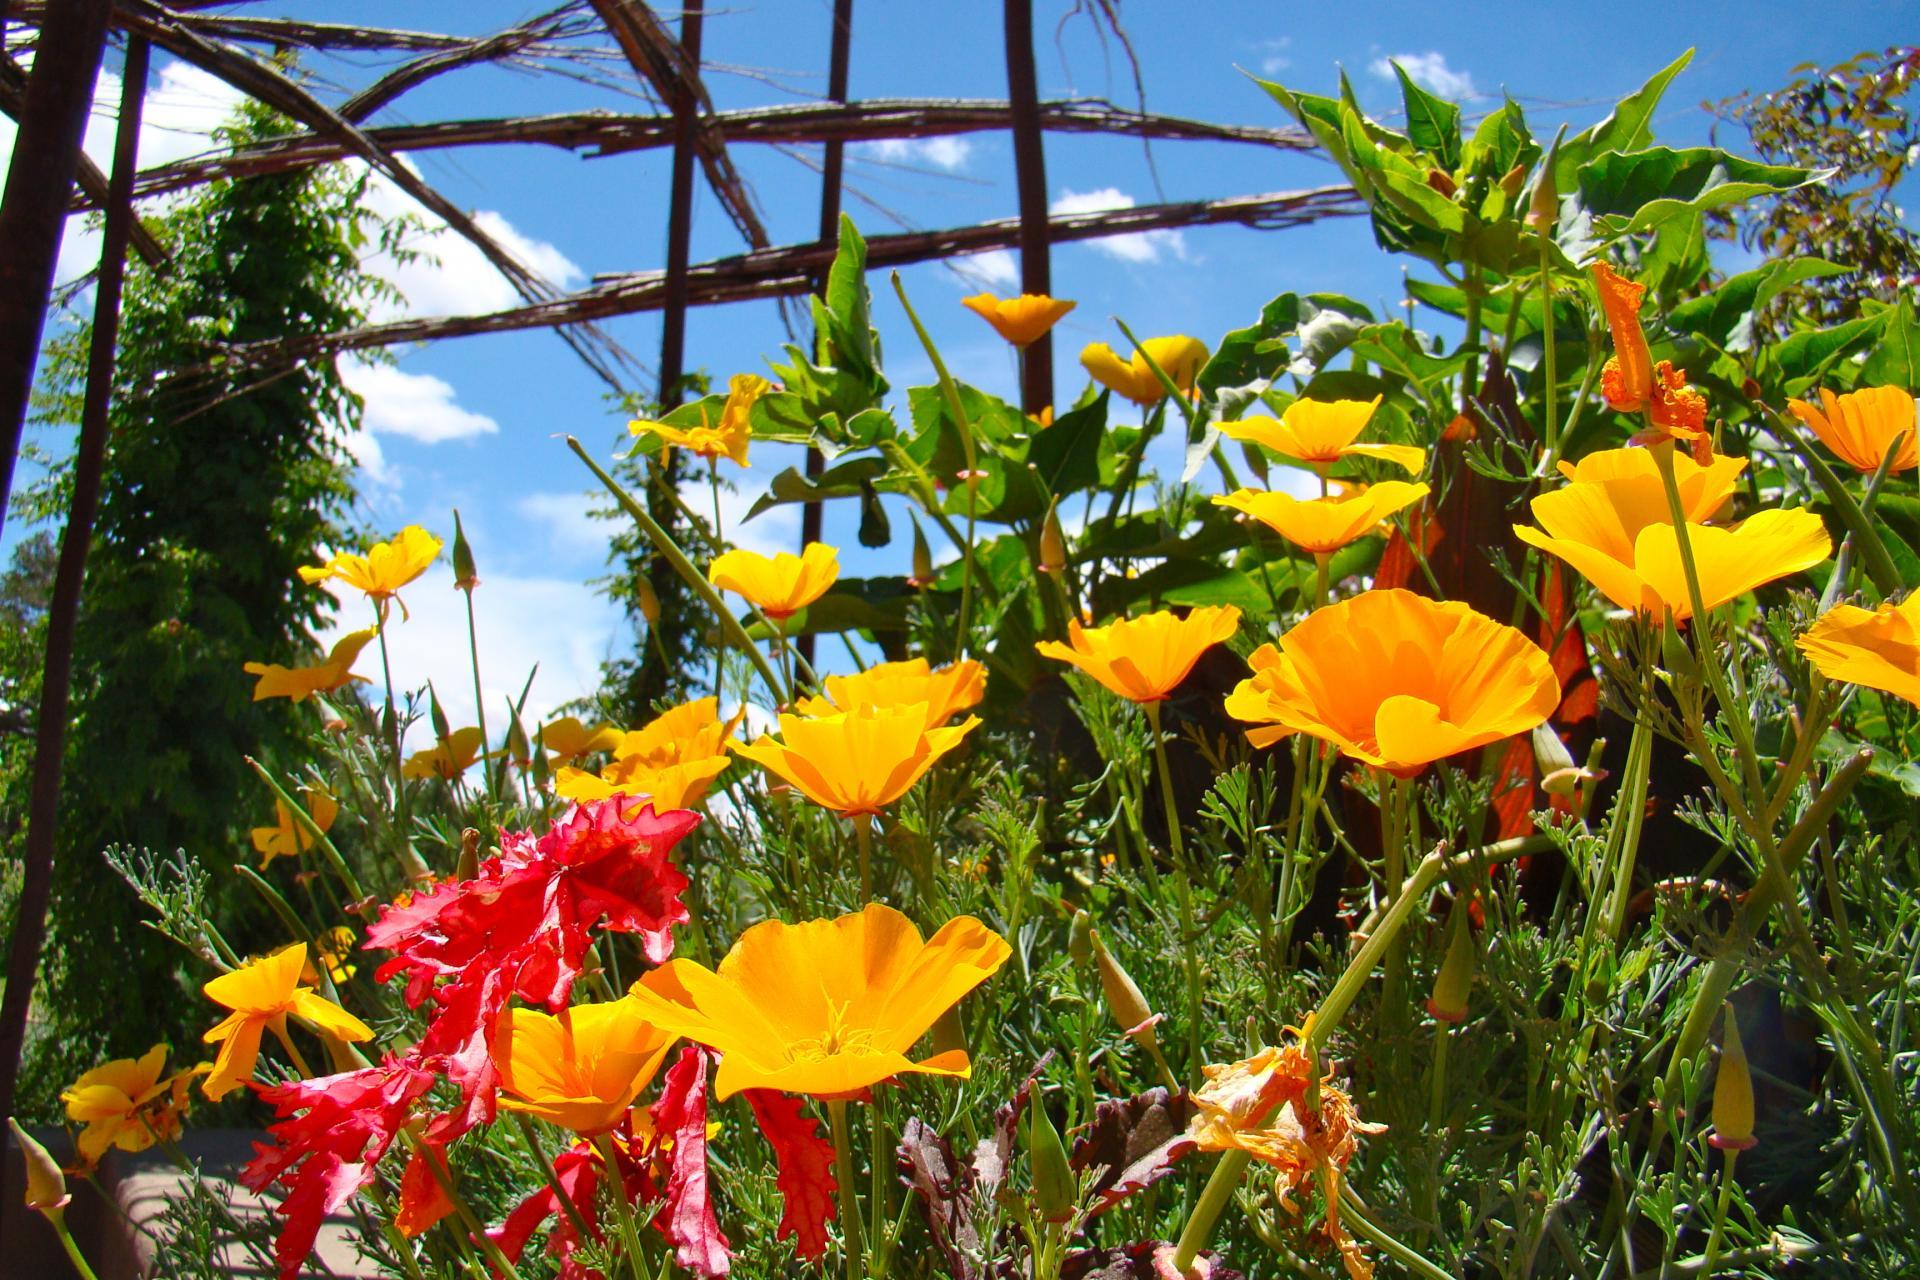 Charmant Santa Fe Botanical Garden Awarded Prestigious IMLS Grant